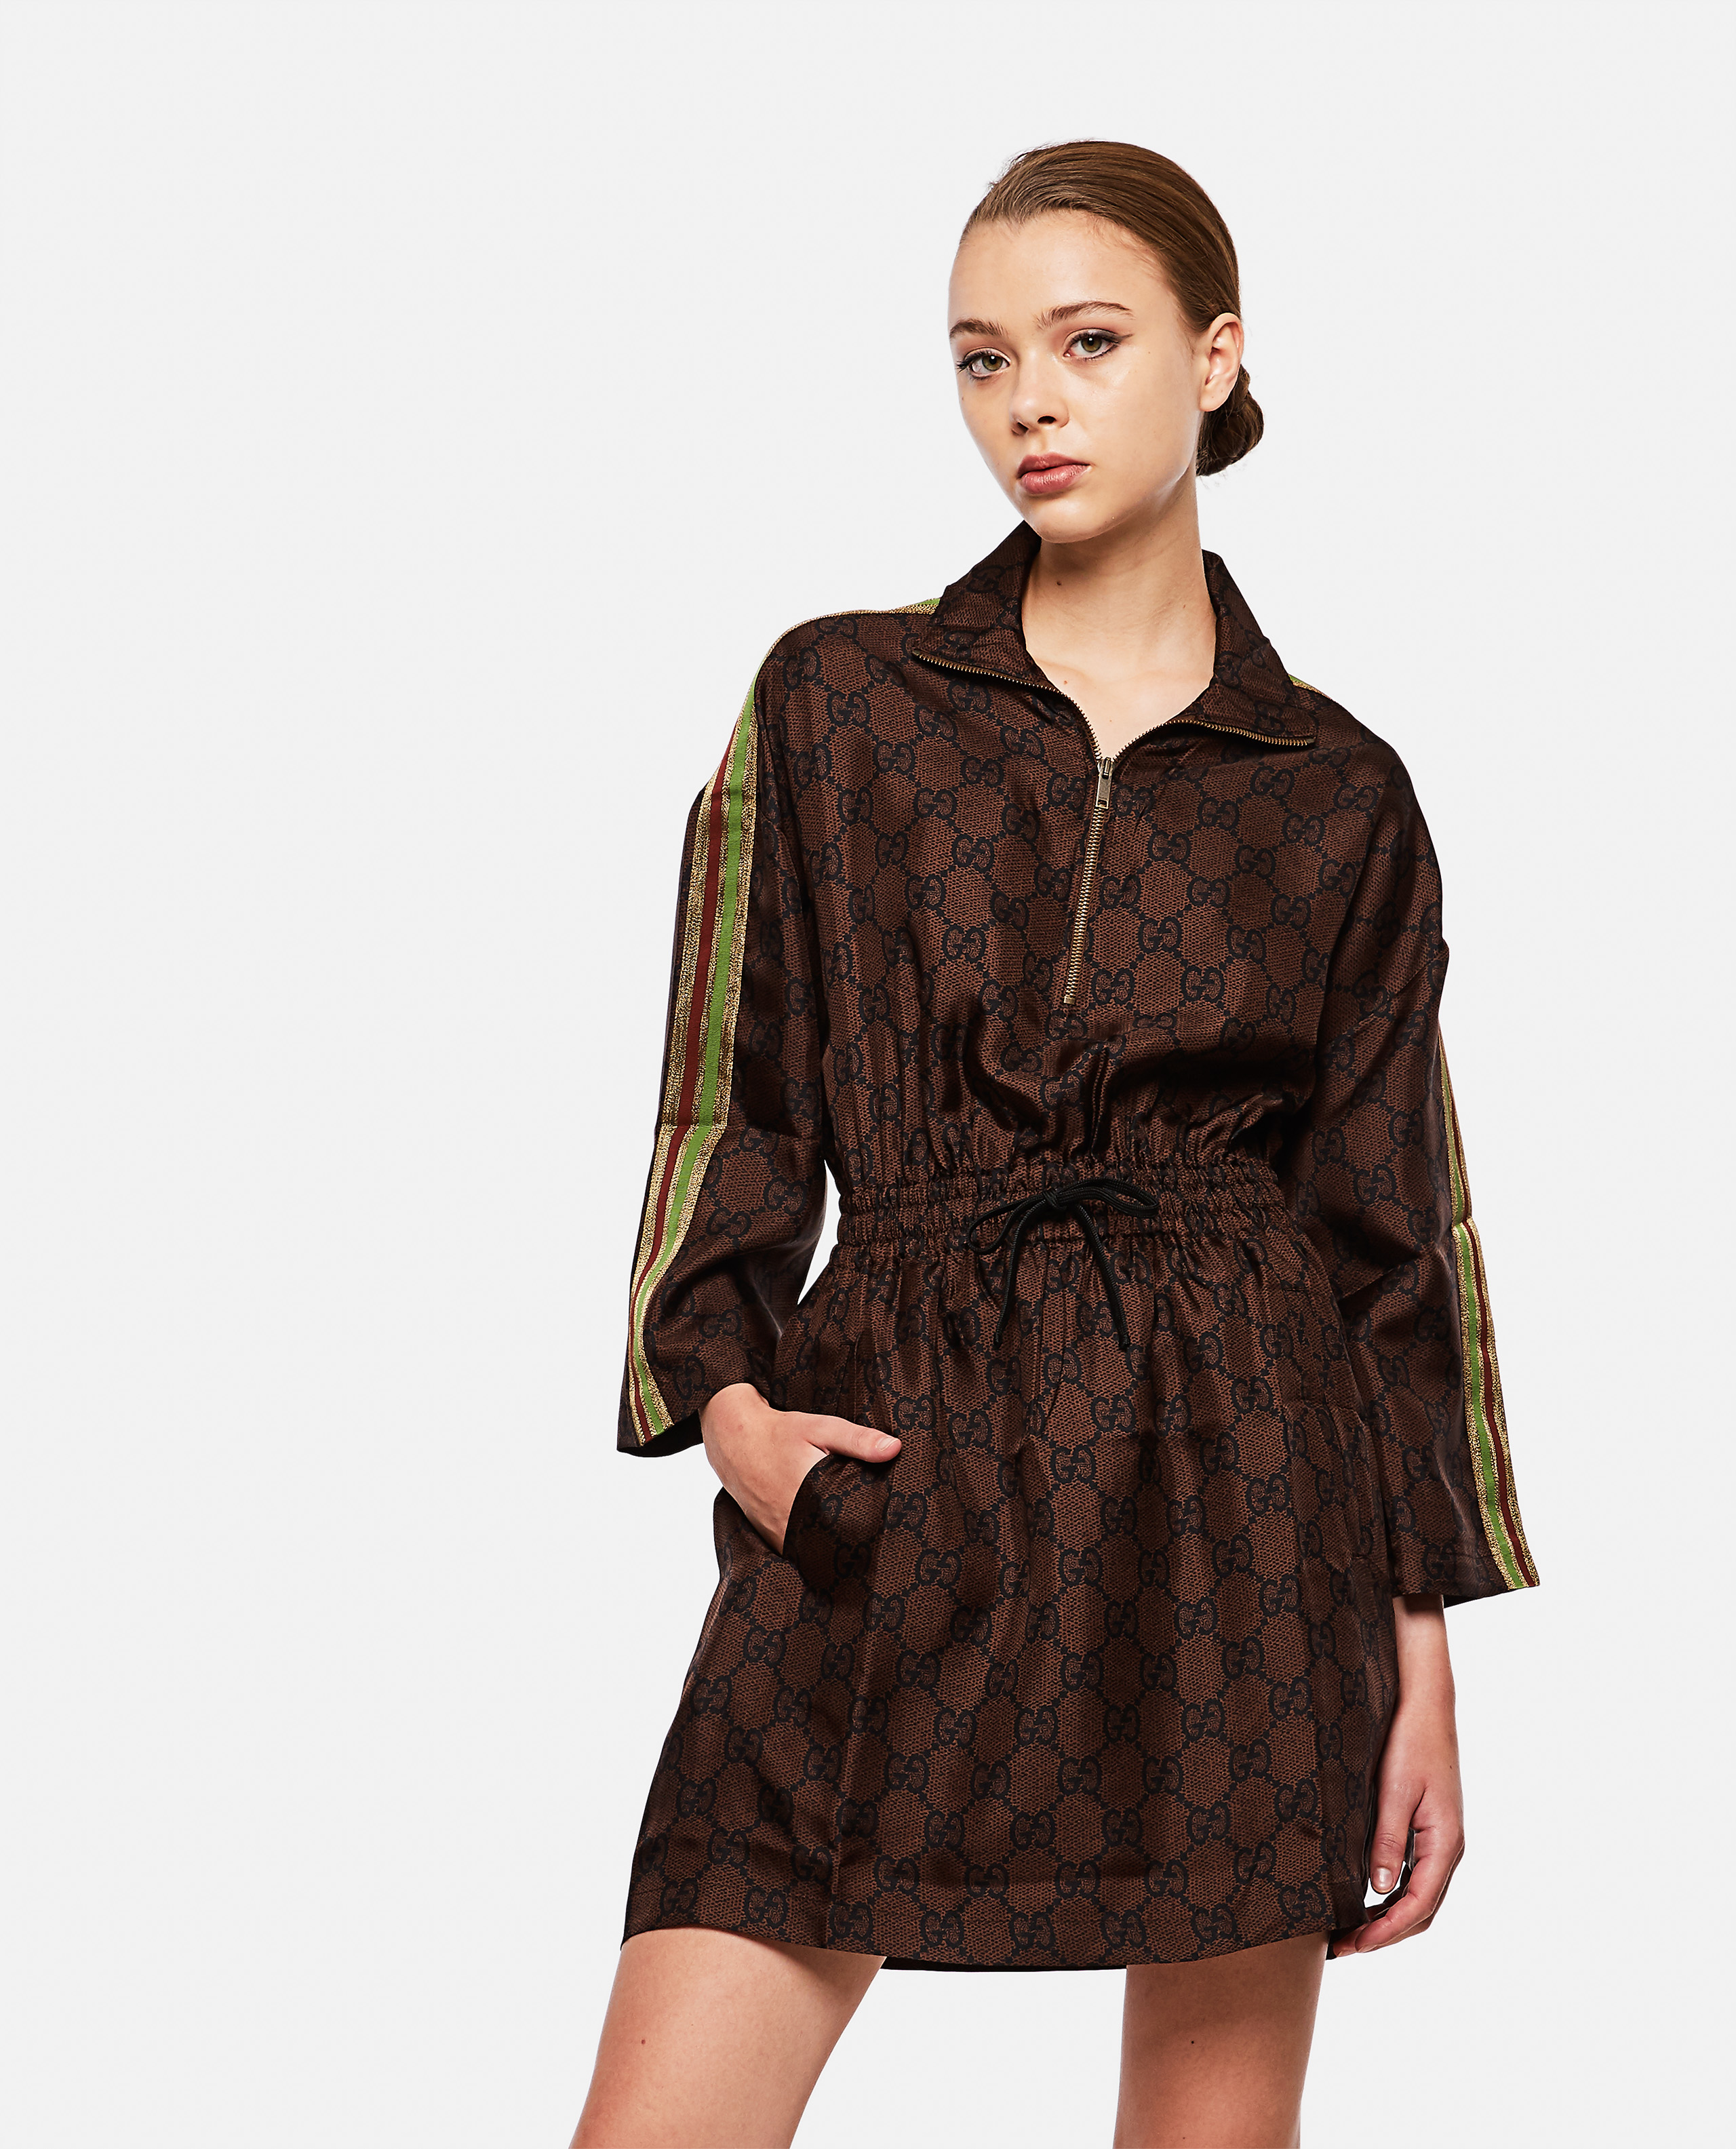 Silk dress with GG Supreme print